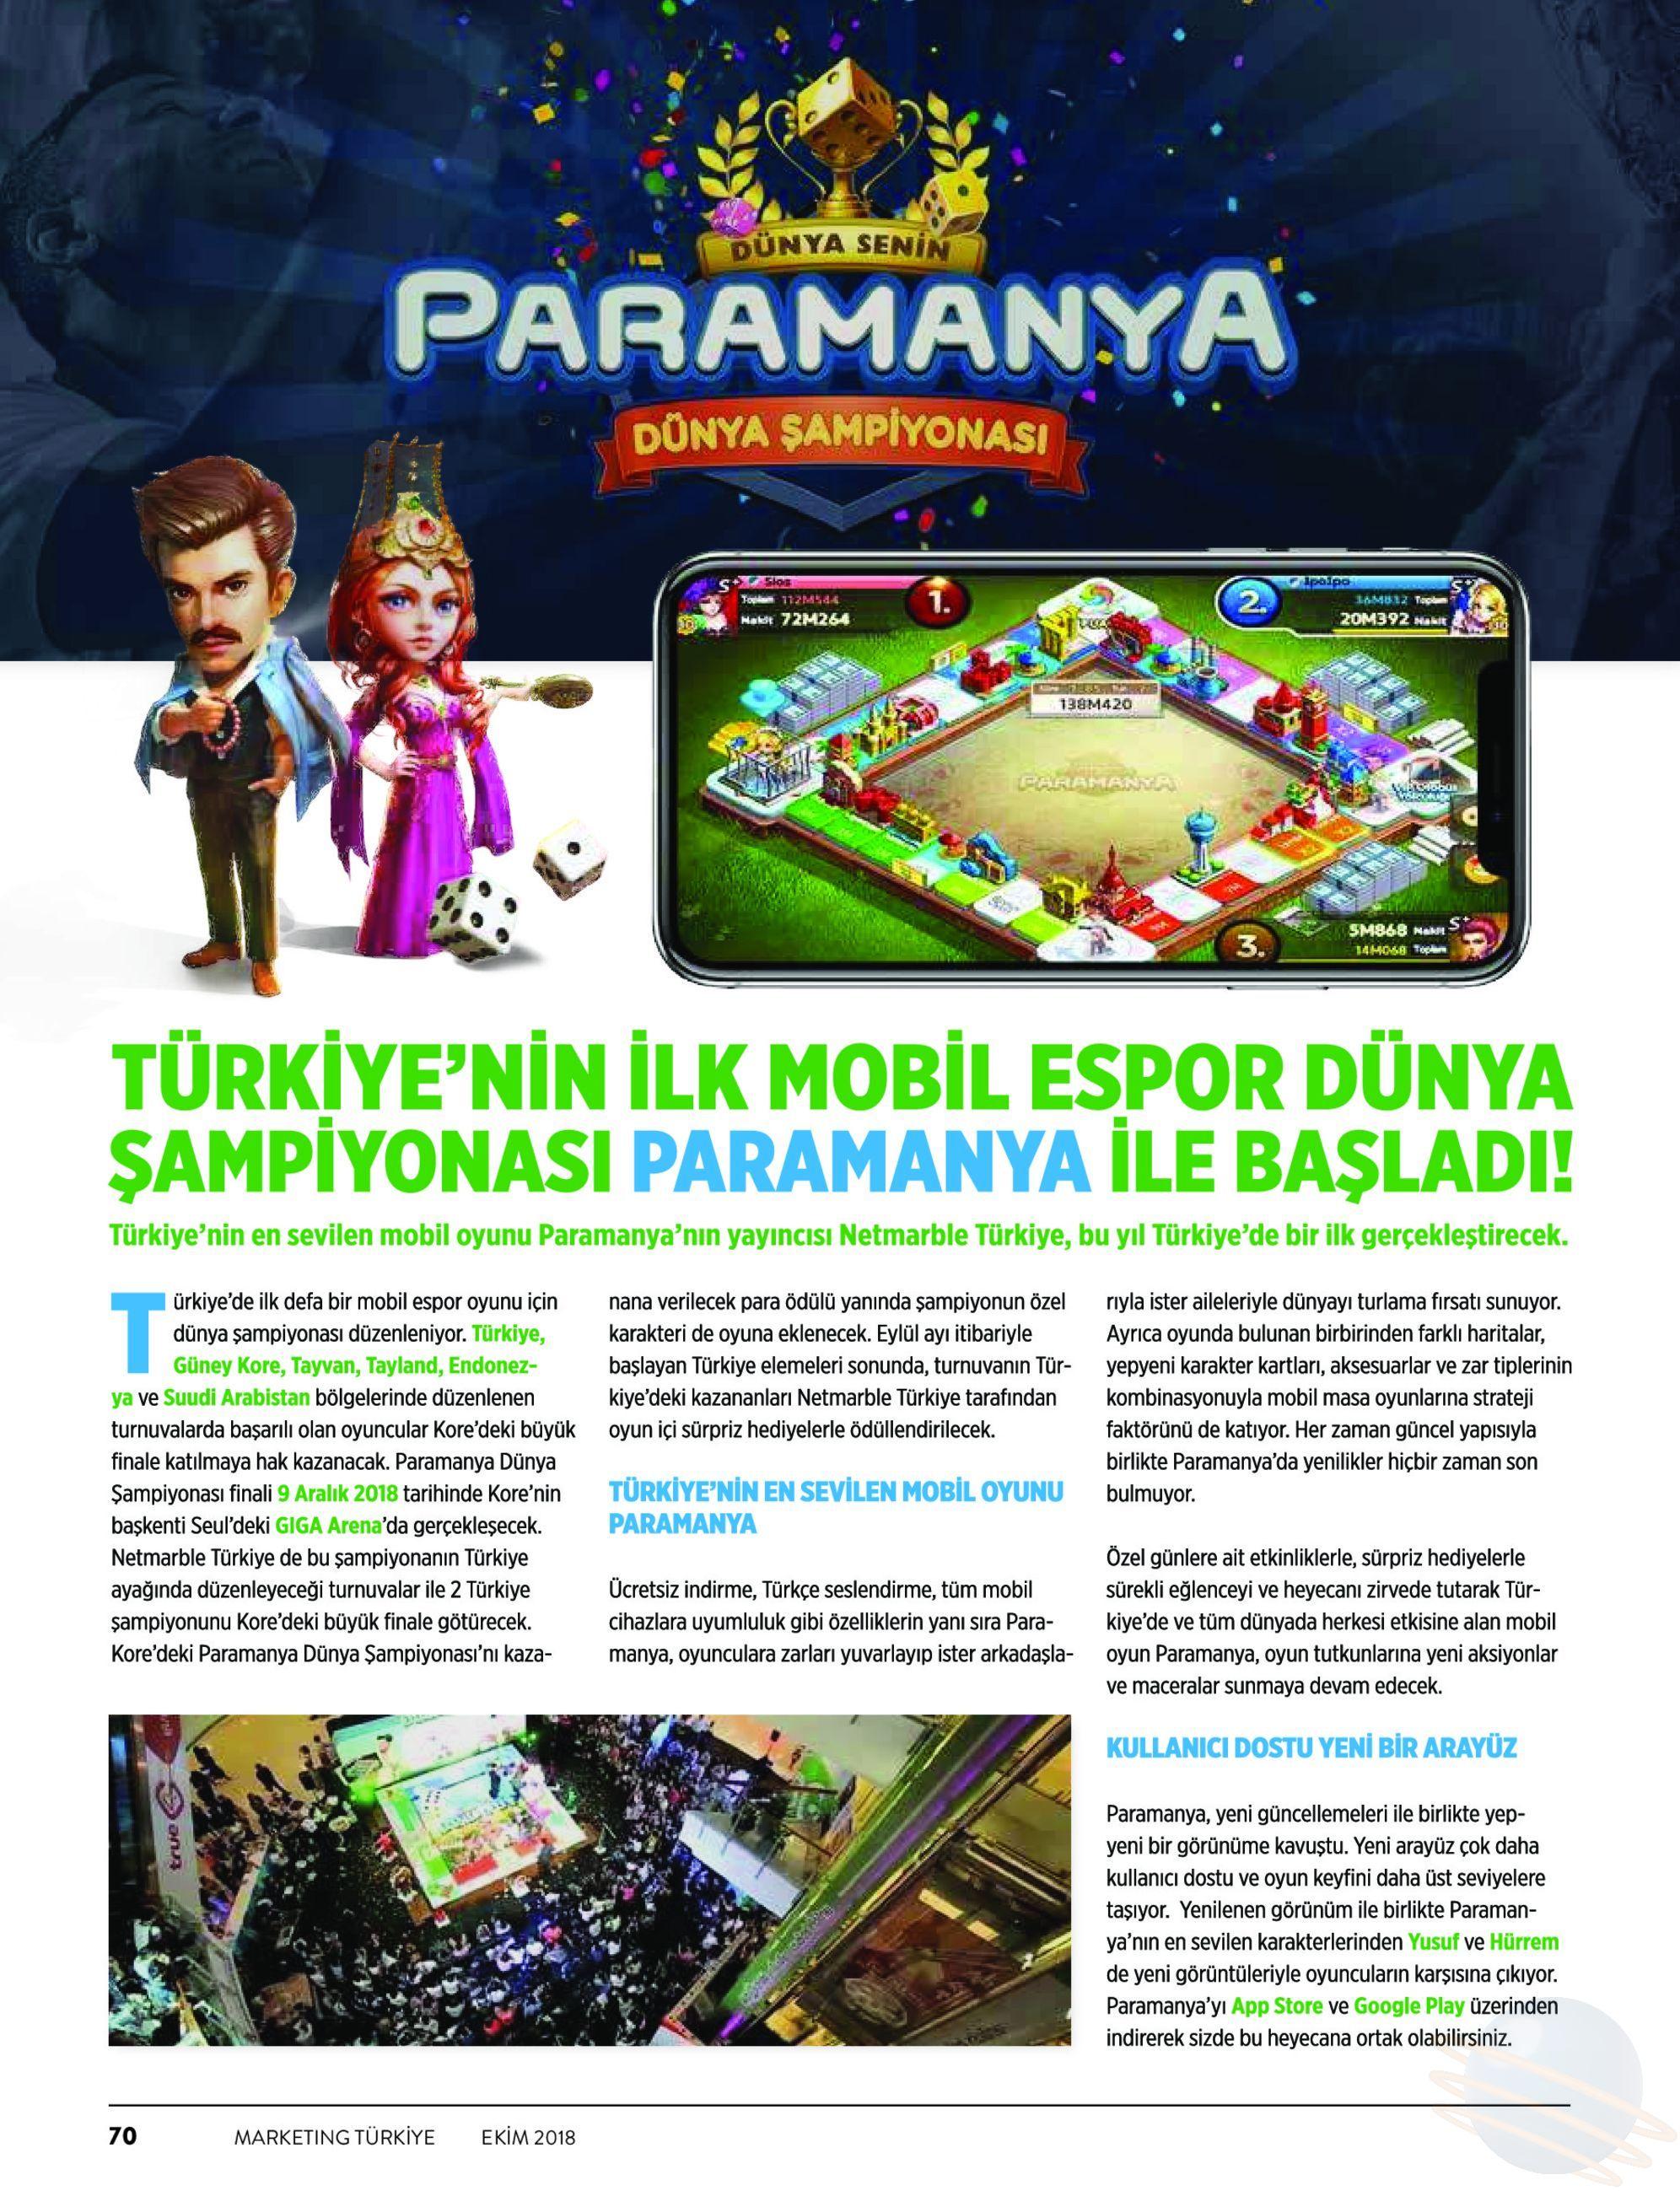 marketing_turkiye